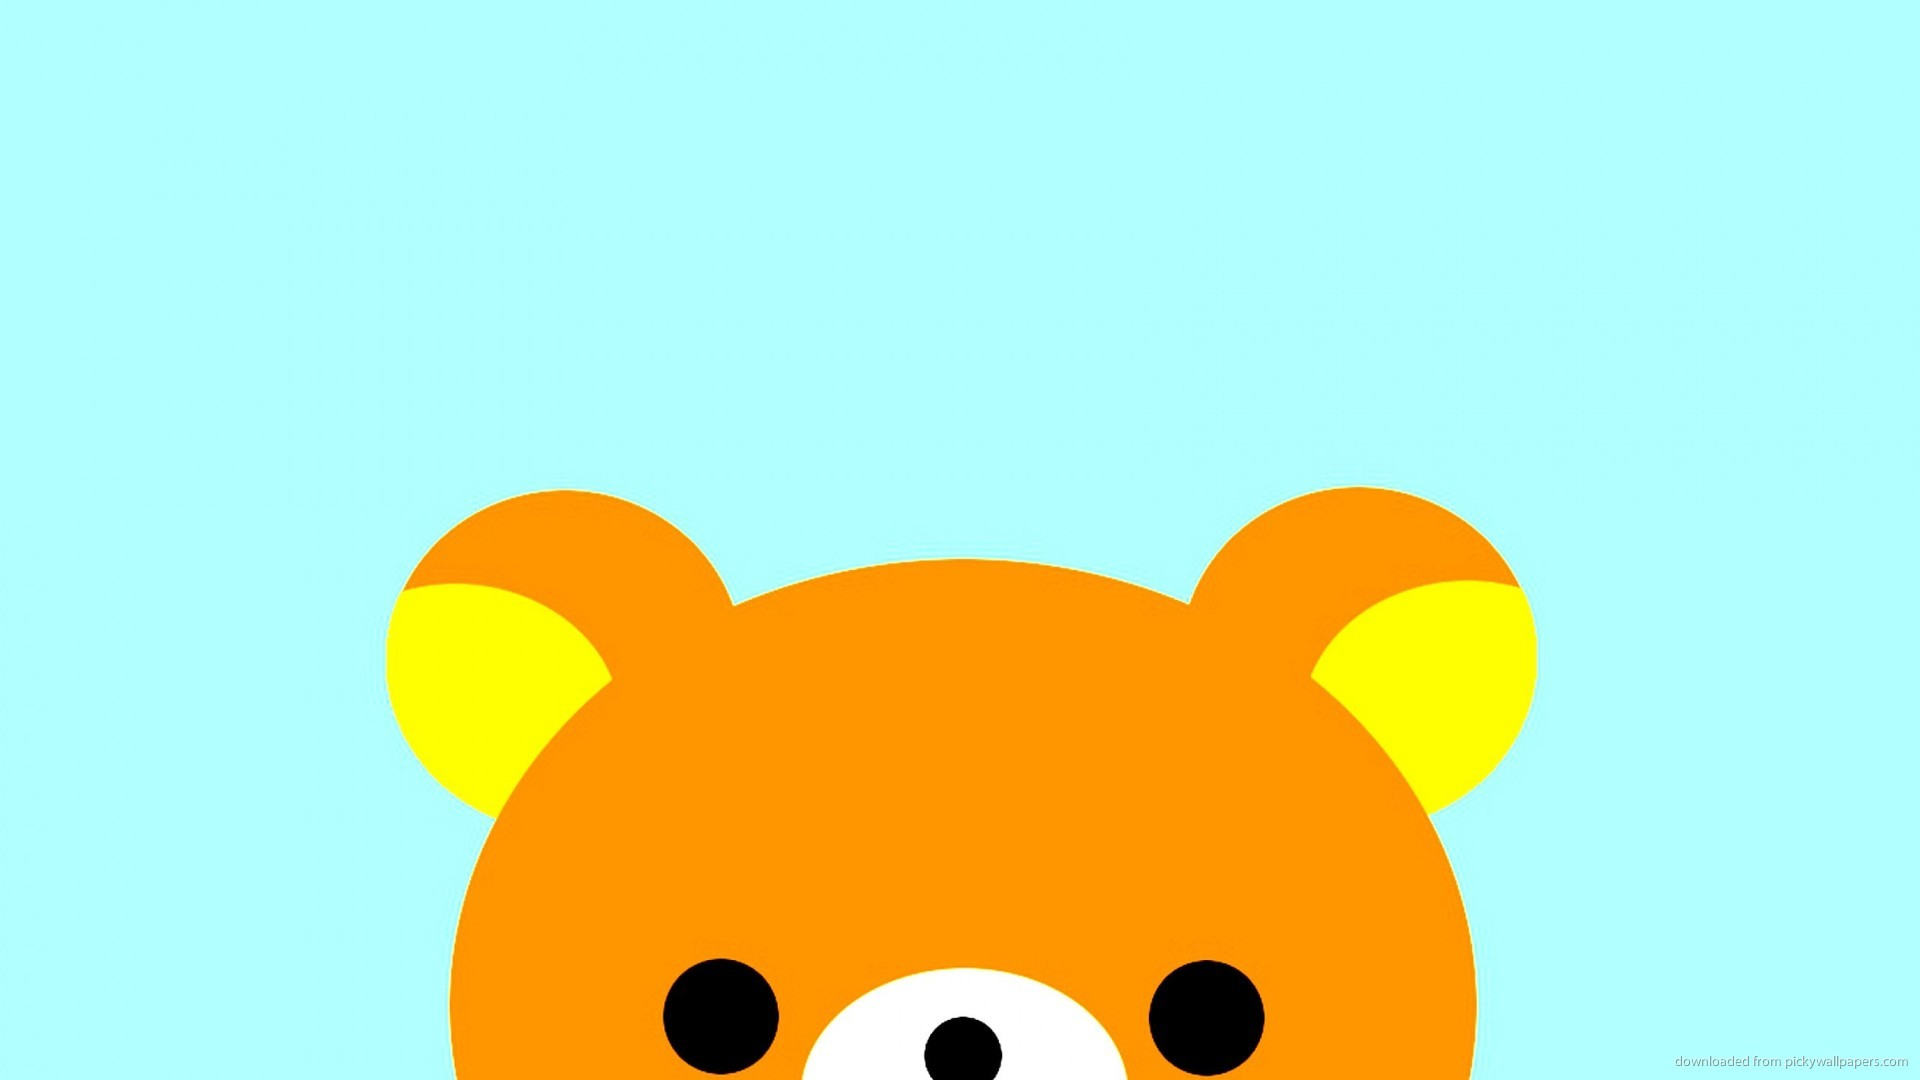 hinh-nen-cute-cho-may-tinh-dep-nhat-wallppaer-cute-17.jpg